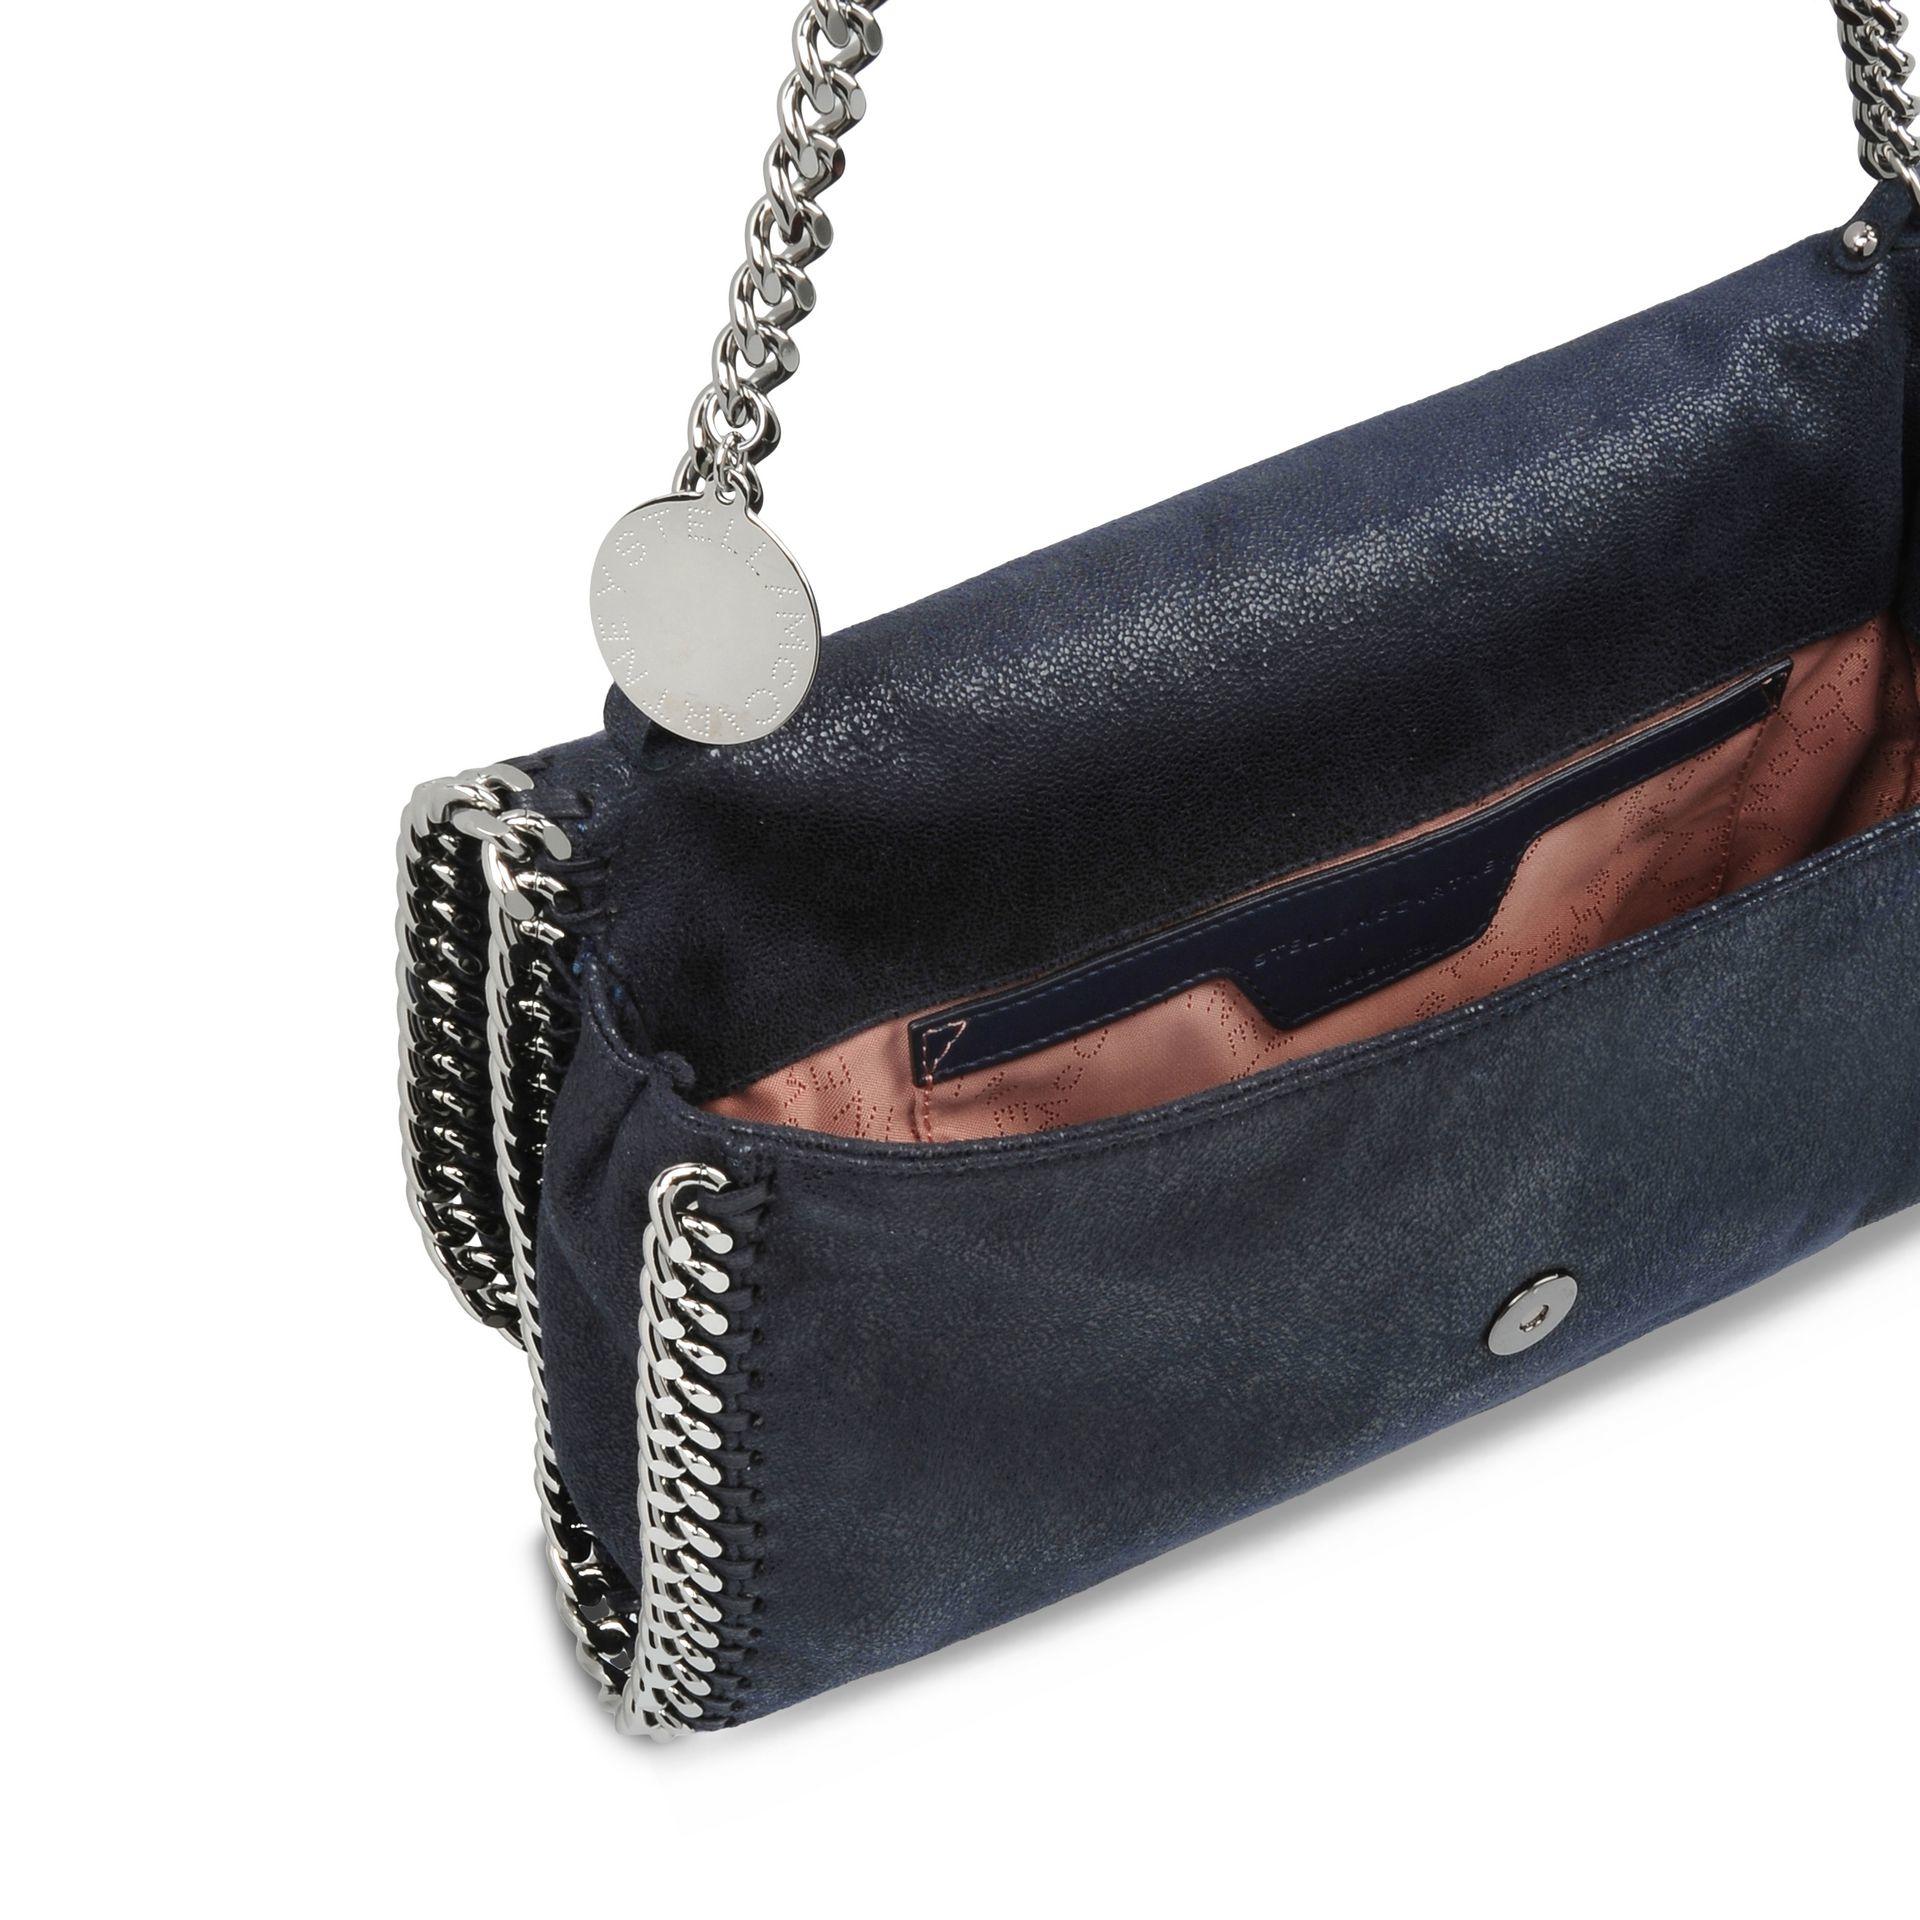 18217c36981 Lyst - Stella McCartney Navy Falabella Shaggy Deer Shoulder Bag in Blue